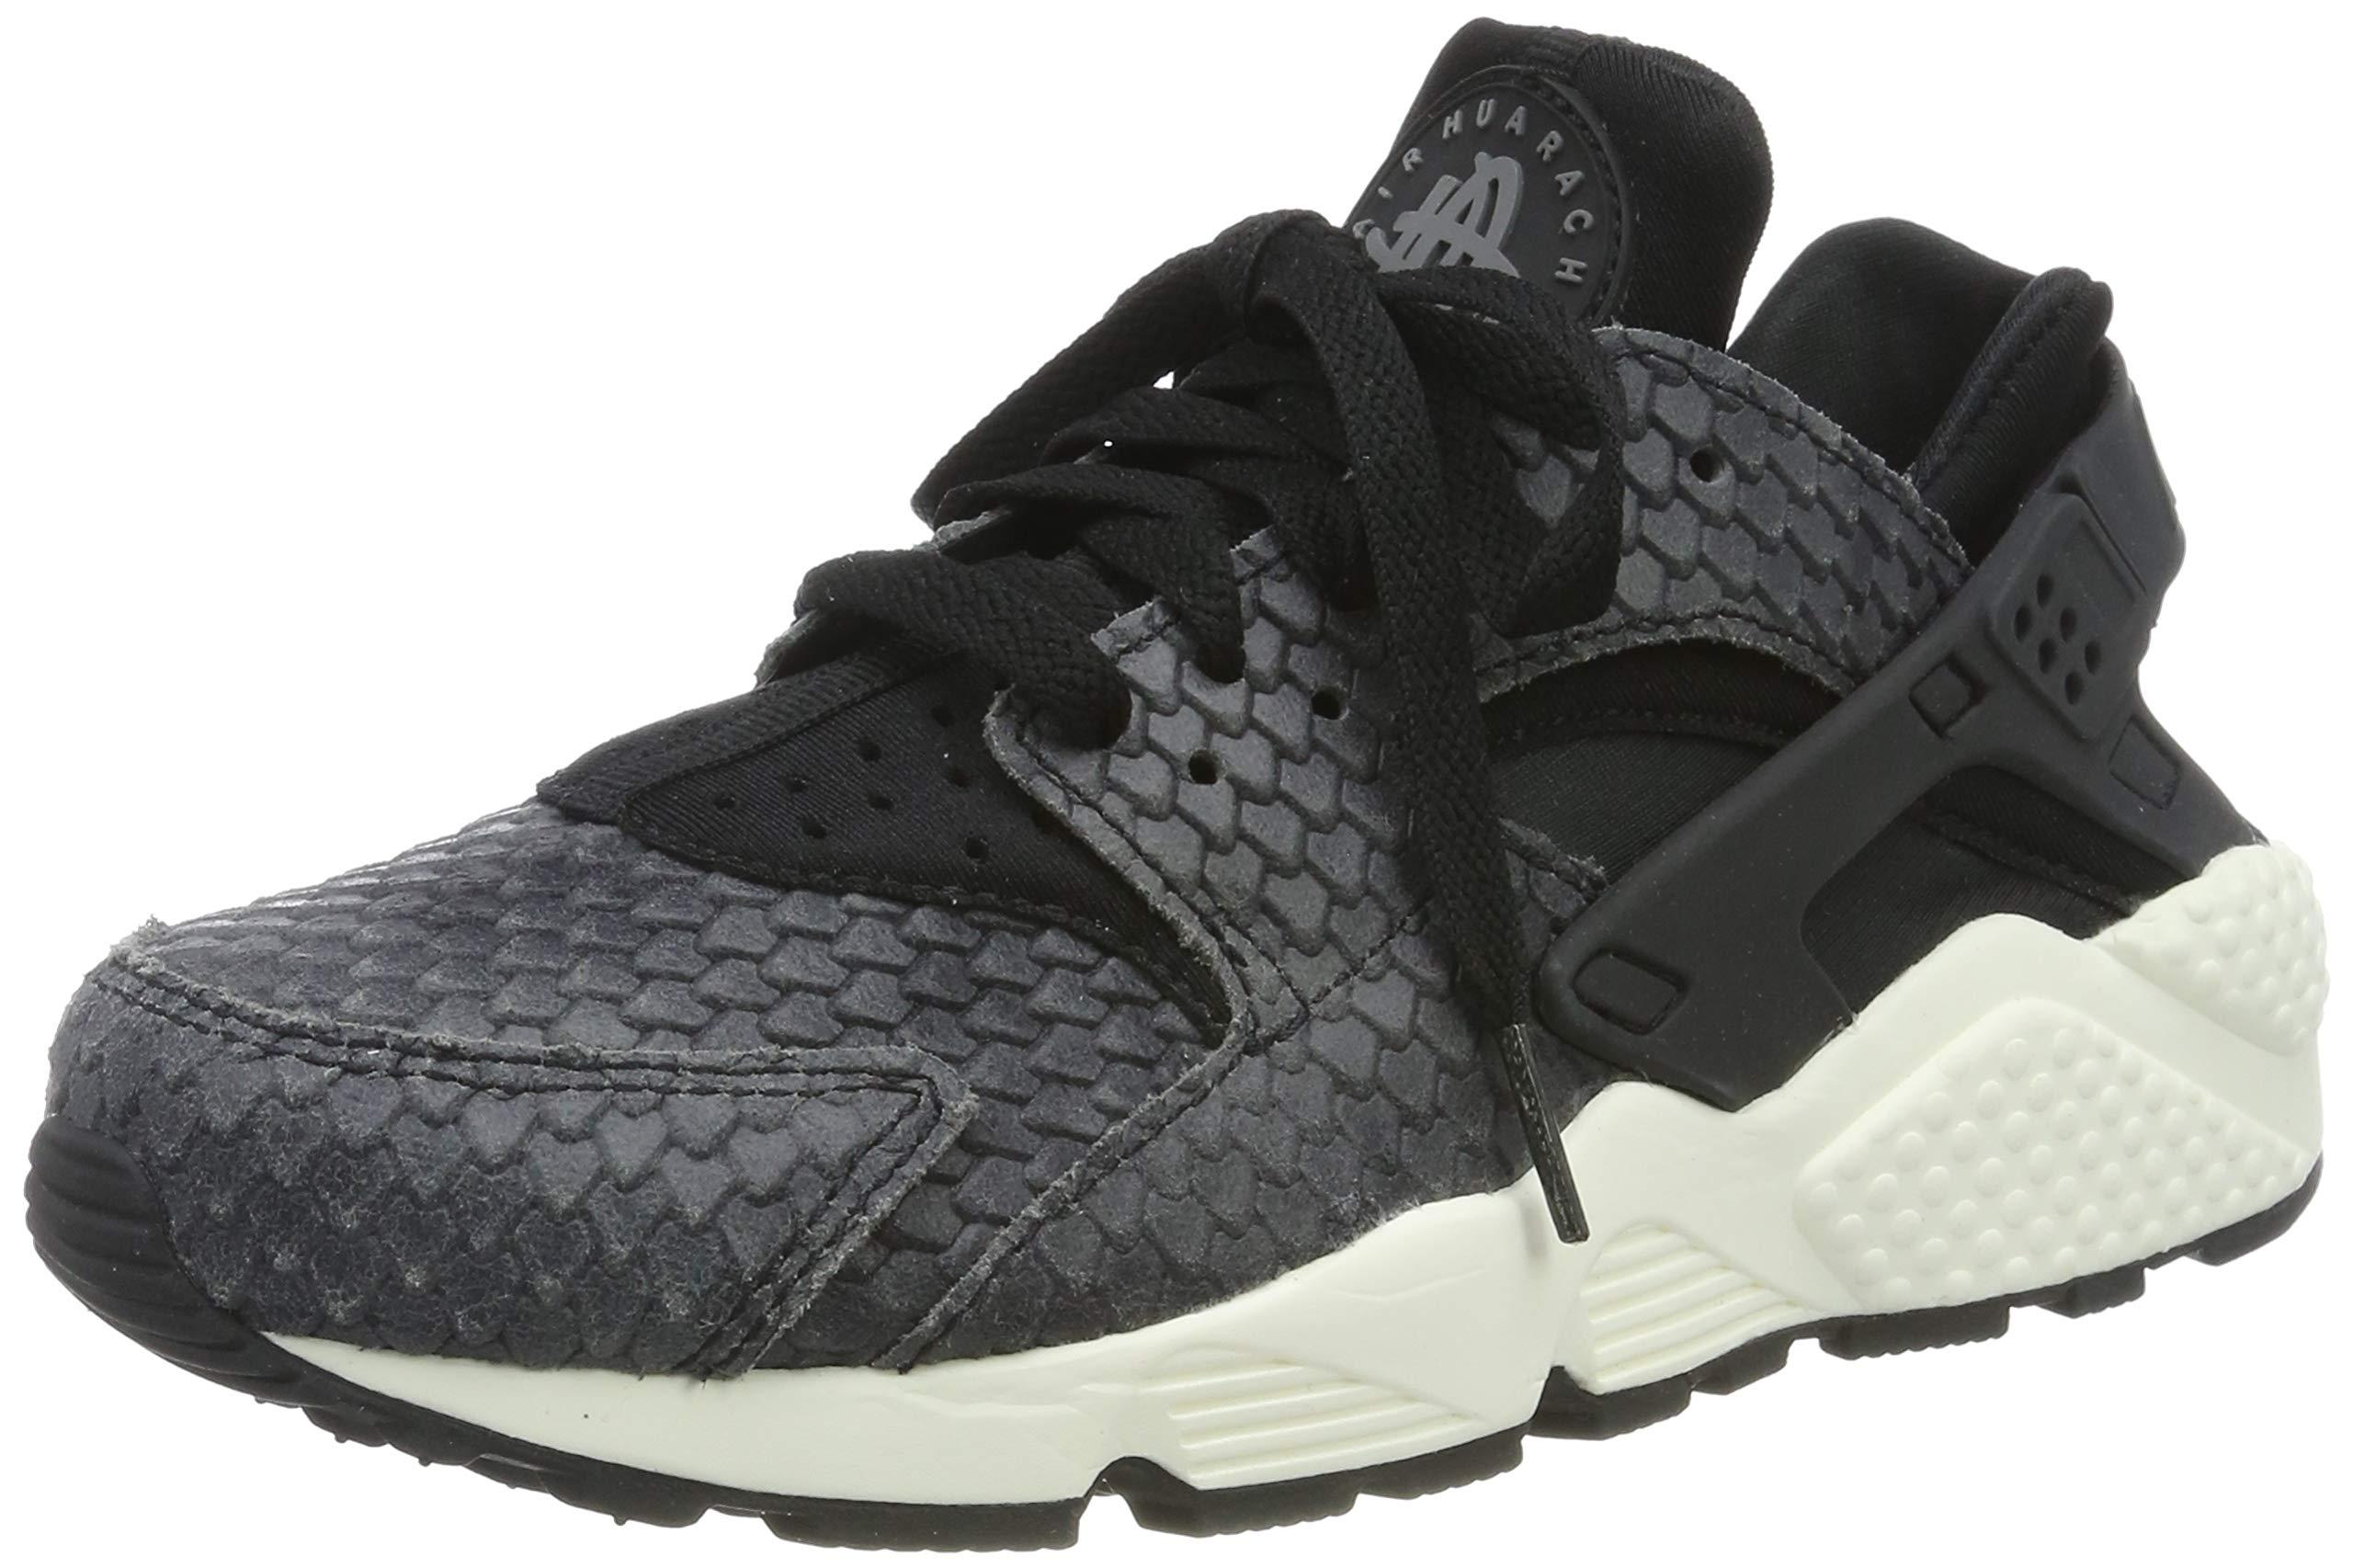 PremiumSneakers Nike Black Basse Grey Sportswearair Huarache Run sail dark kXPZiu